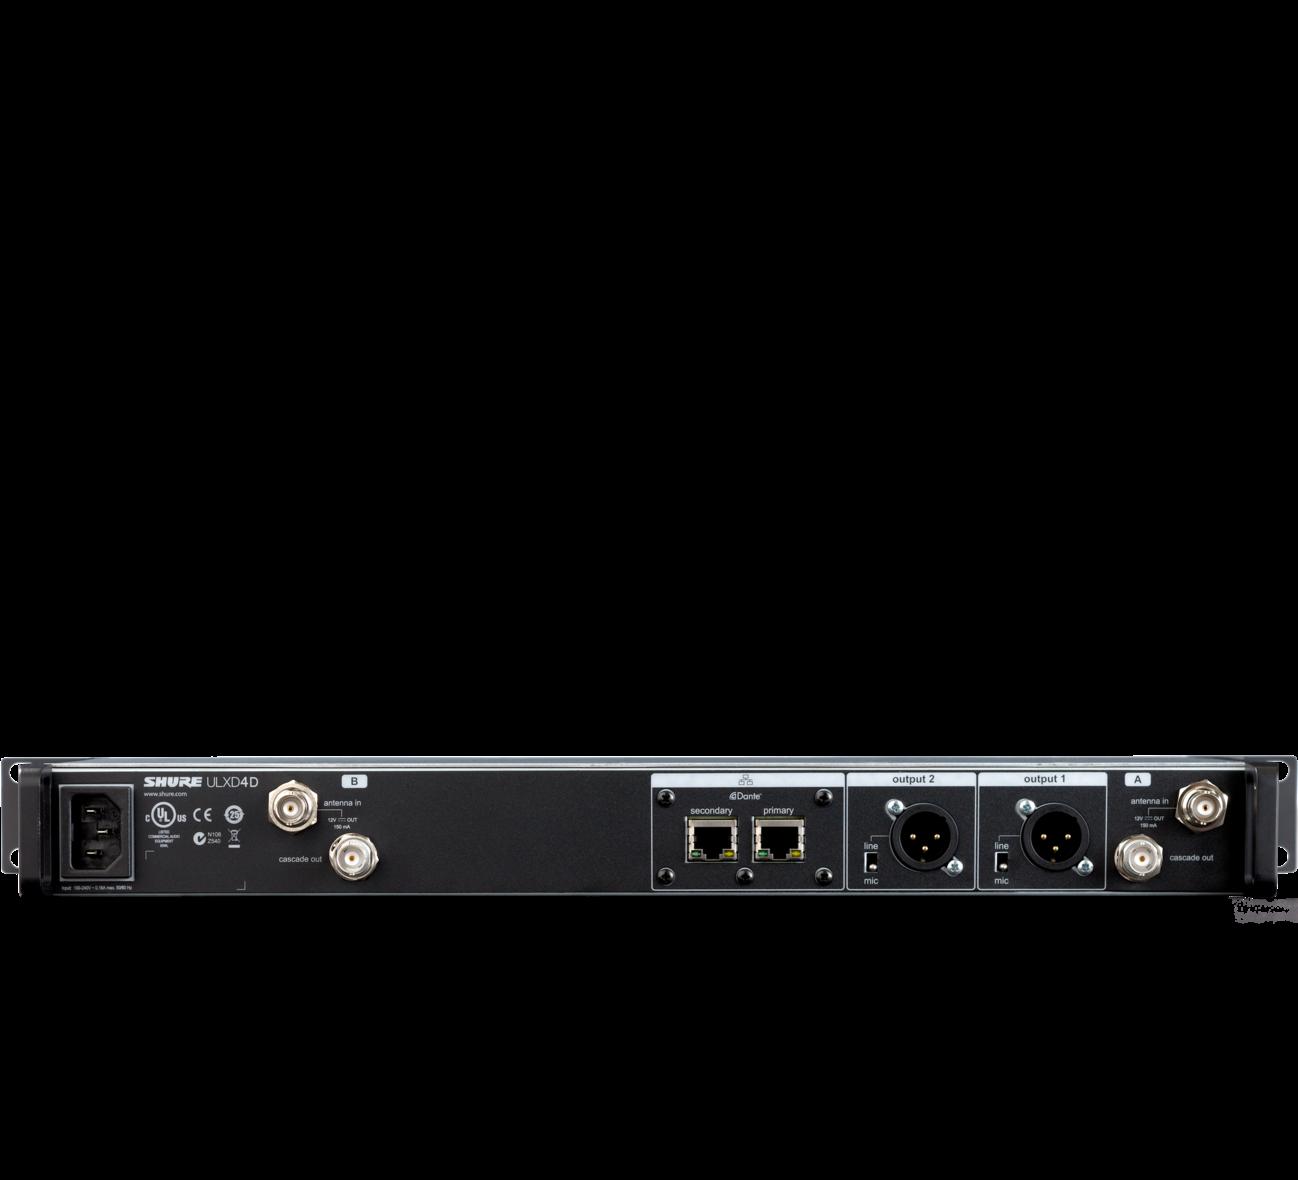 Receptor Shure Digital Com 2 Canais Sistema ULXD - ULXD4 D